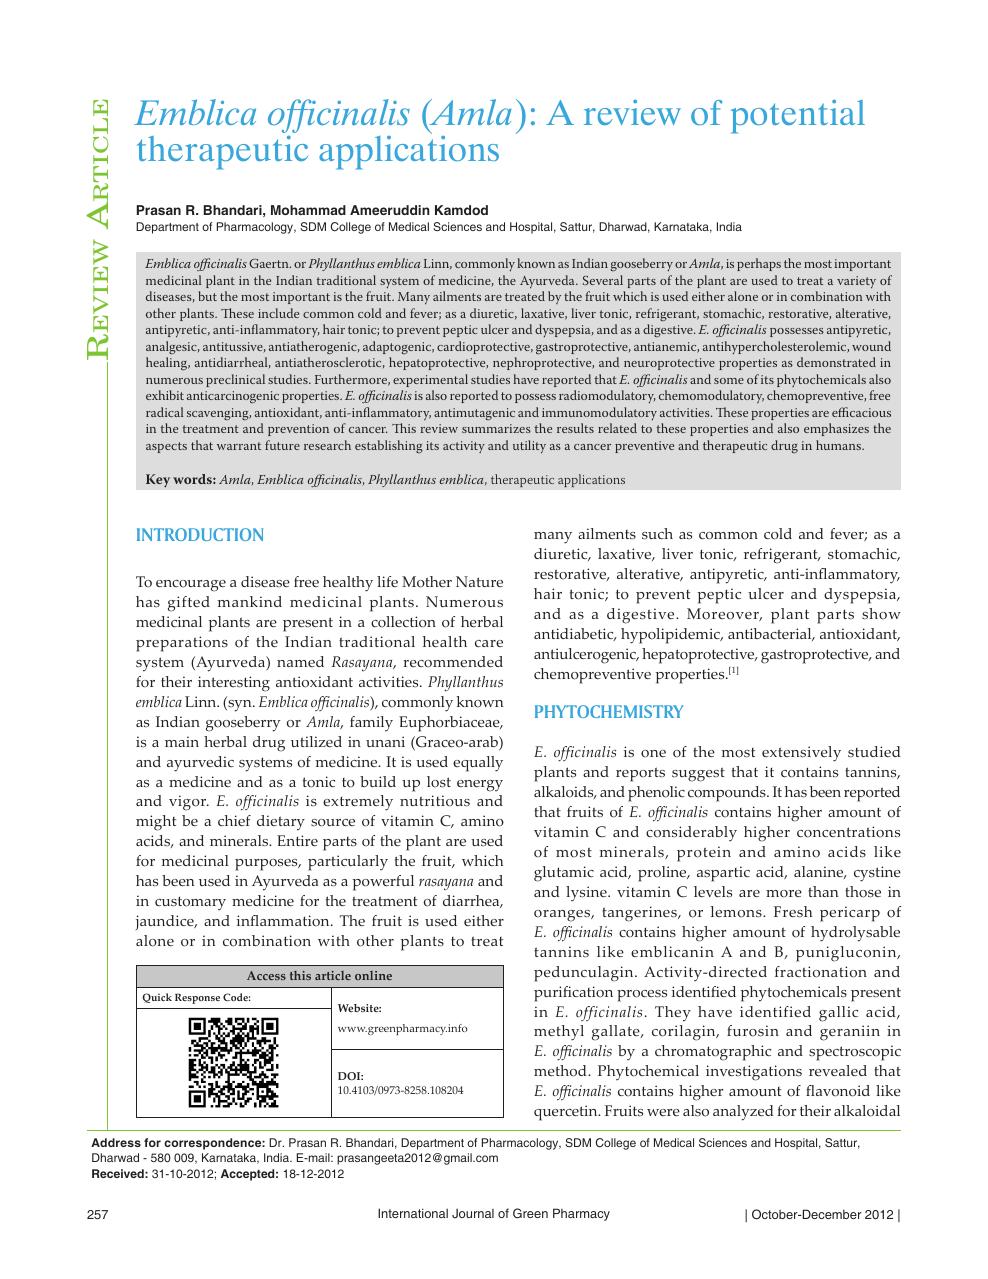 Emblica officinalis ( Amla ): A review of potential